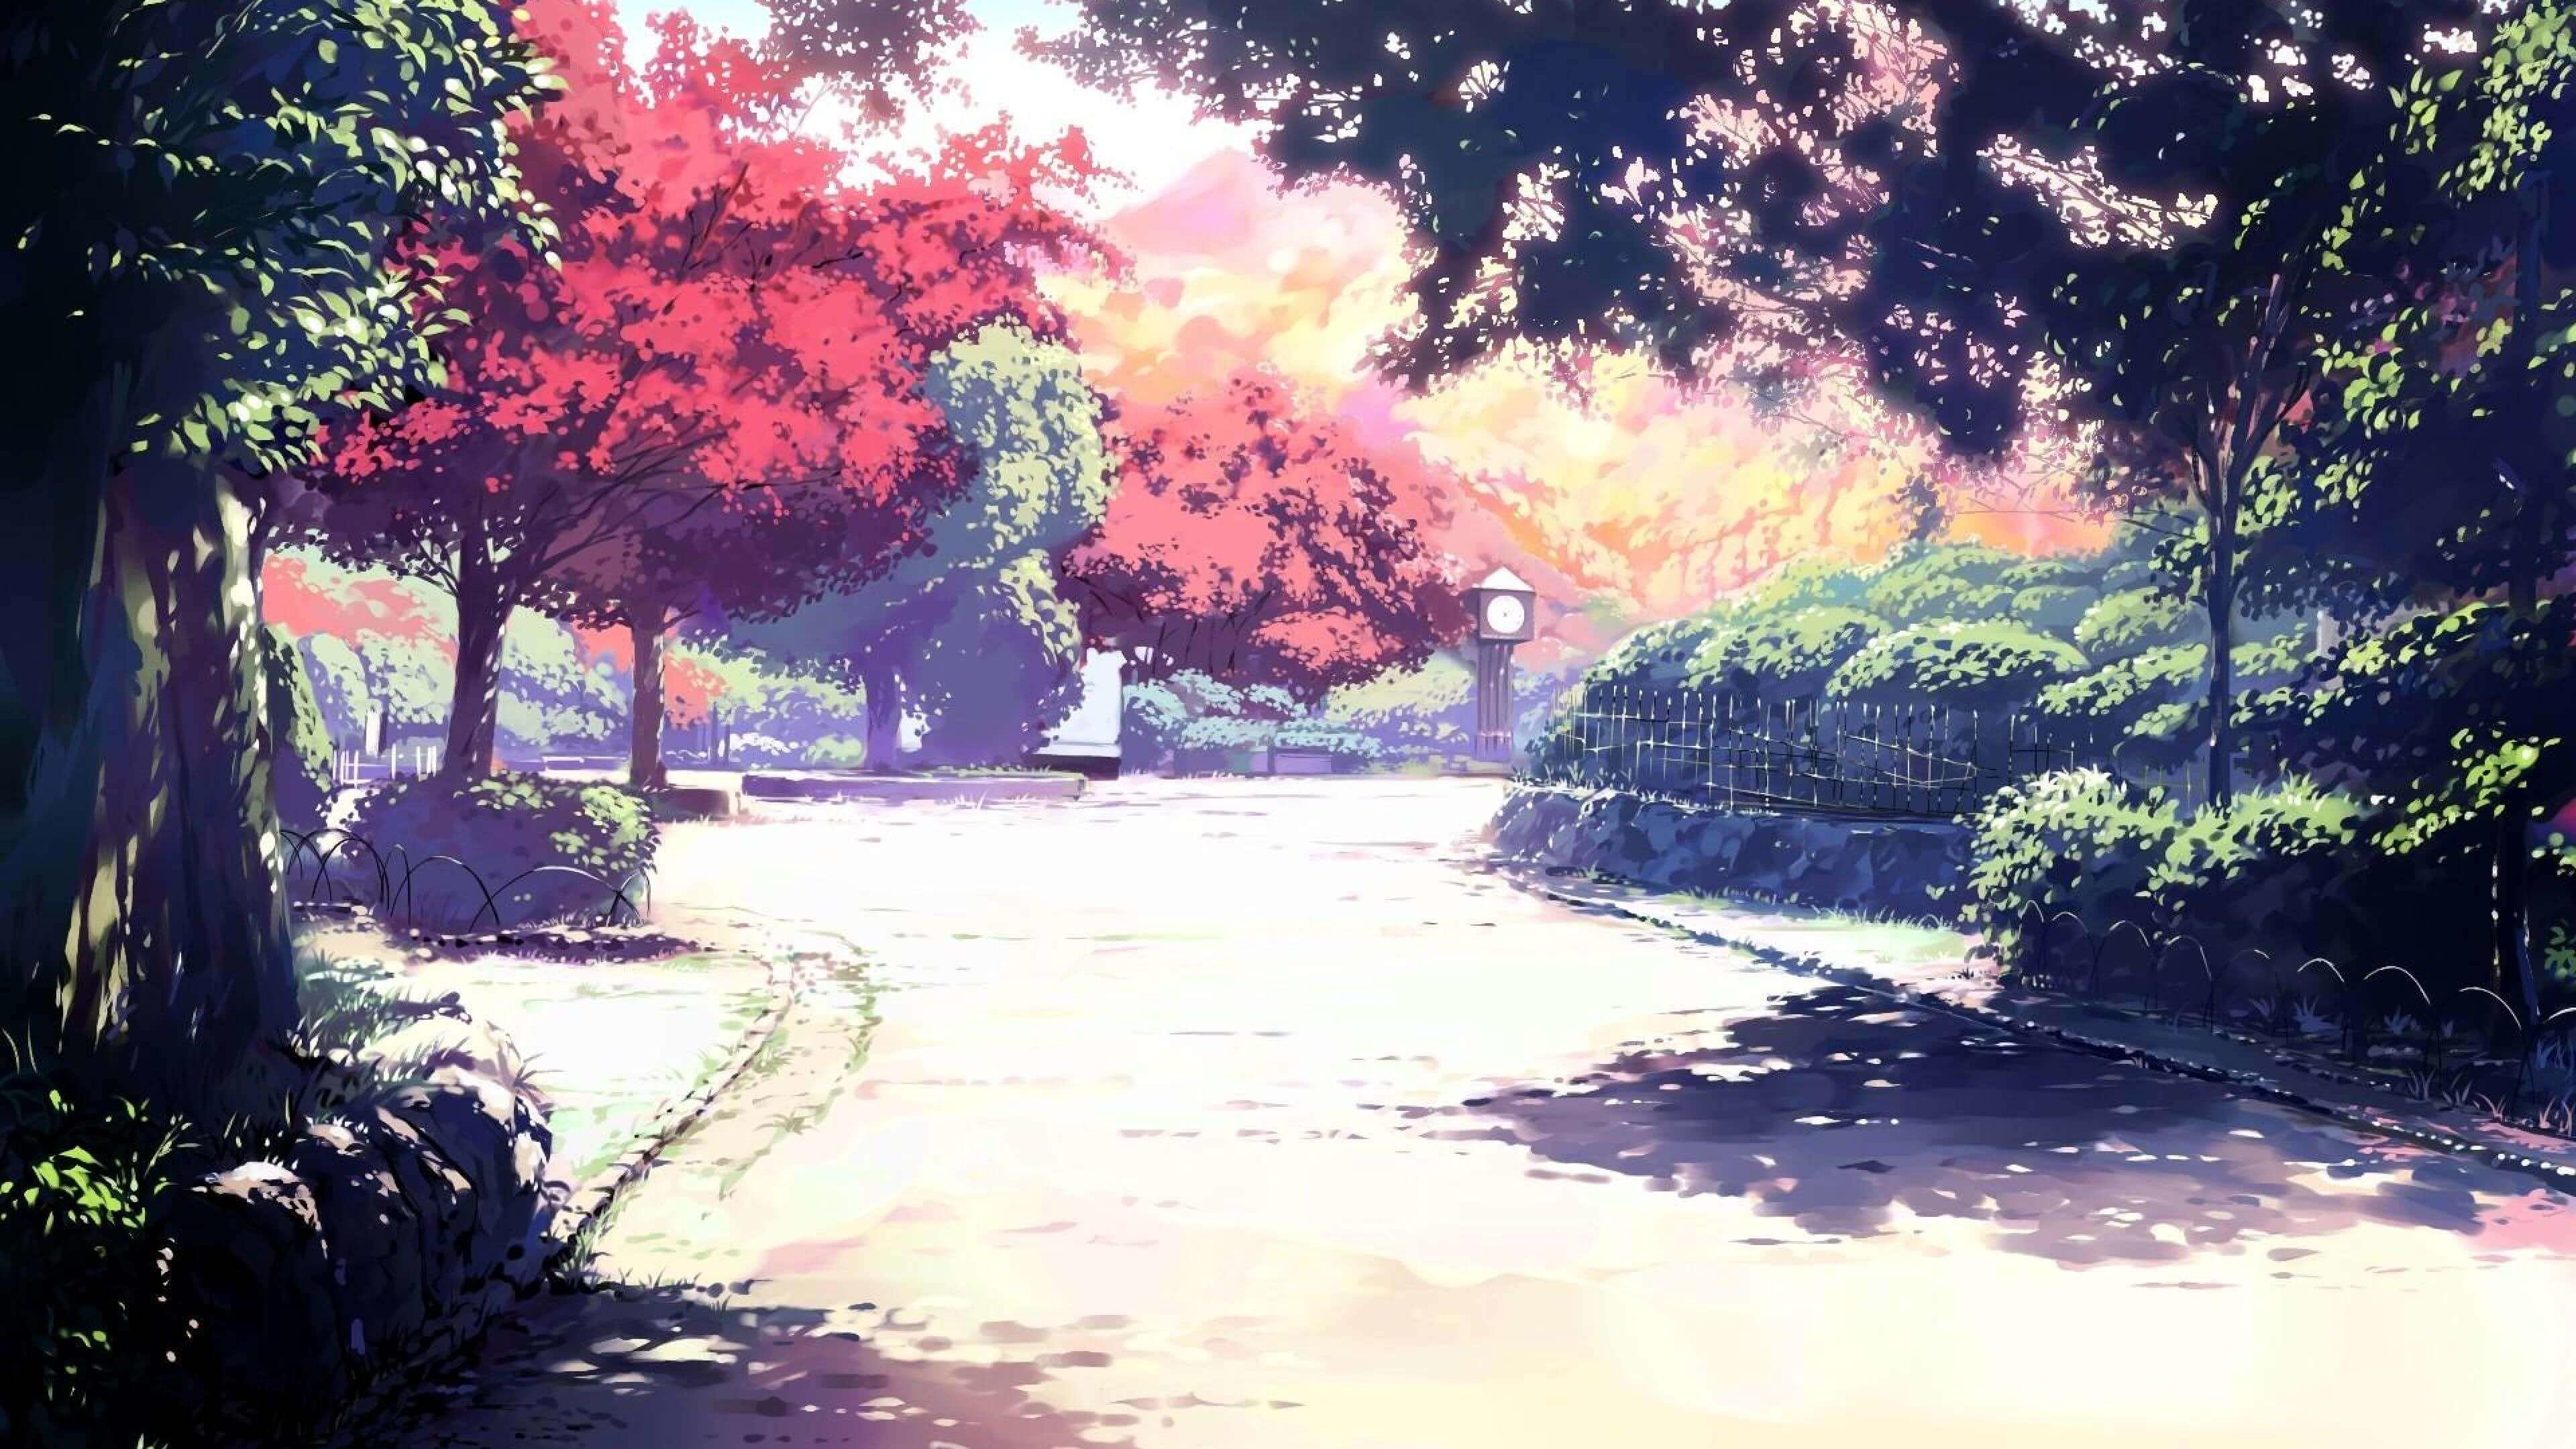 wallpaper.wiki-Sunlight-Spirited-Away-Anime-4k-HD-Wallpaper-PIC-WPE007890